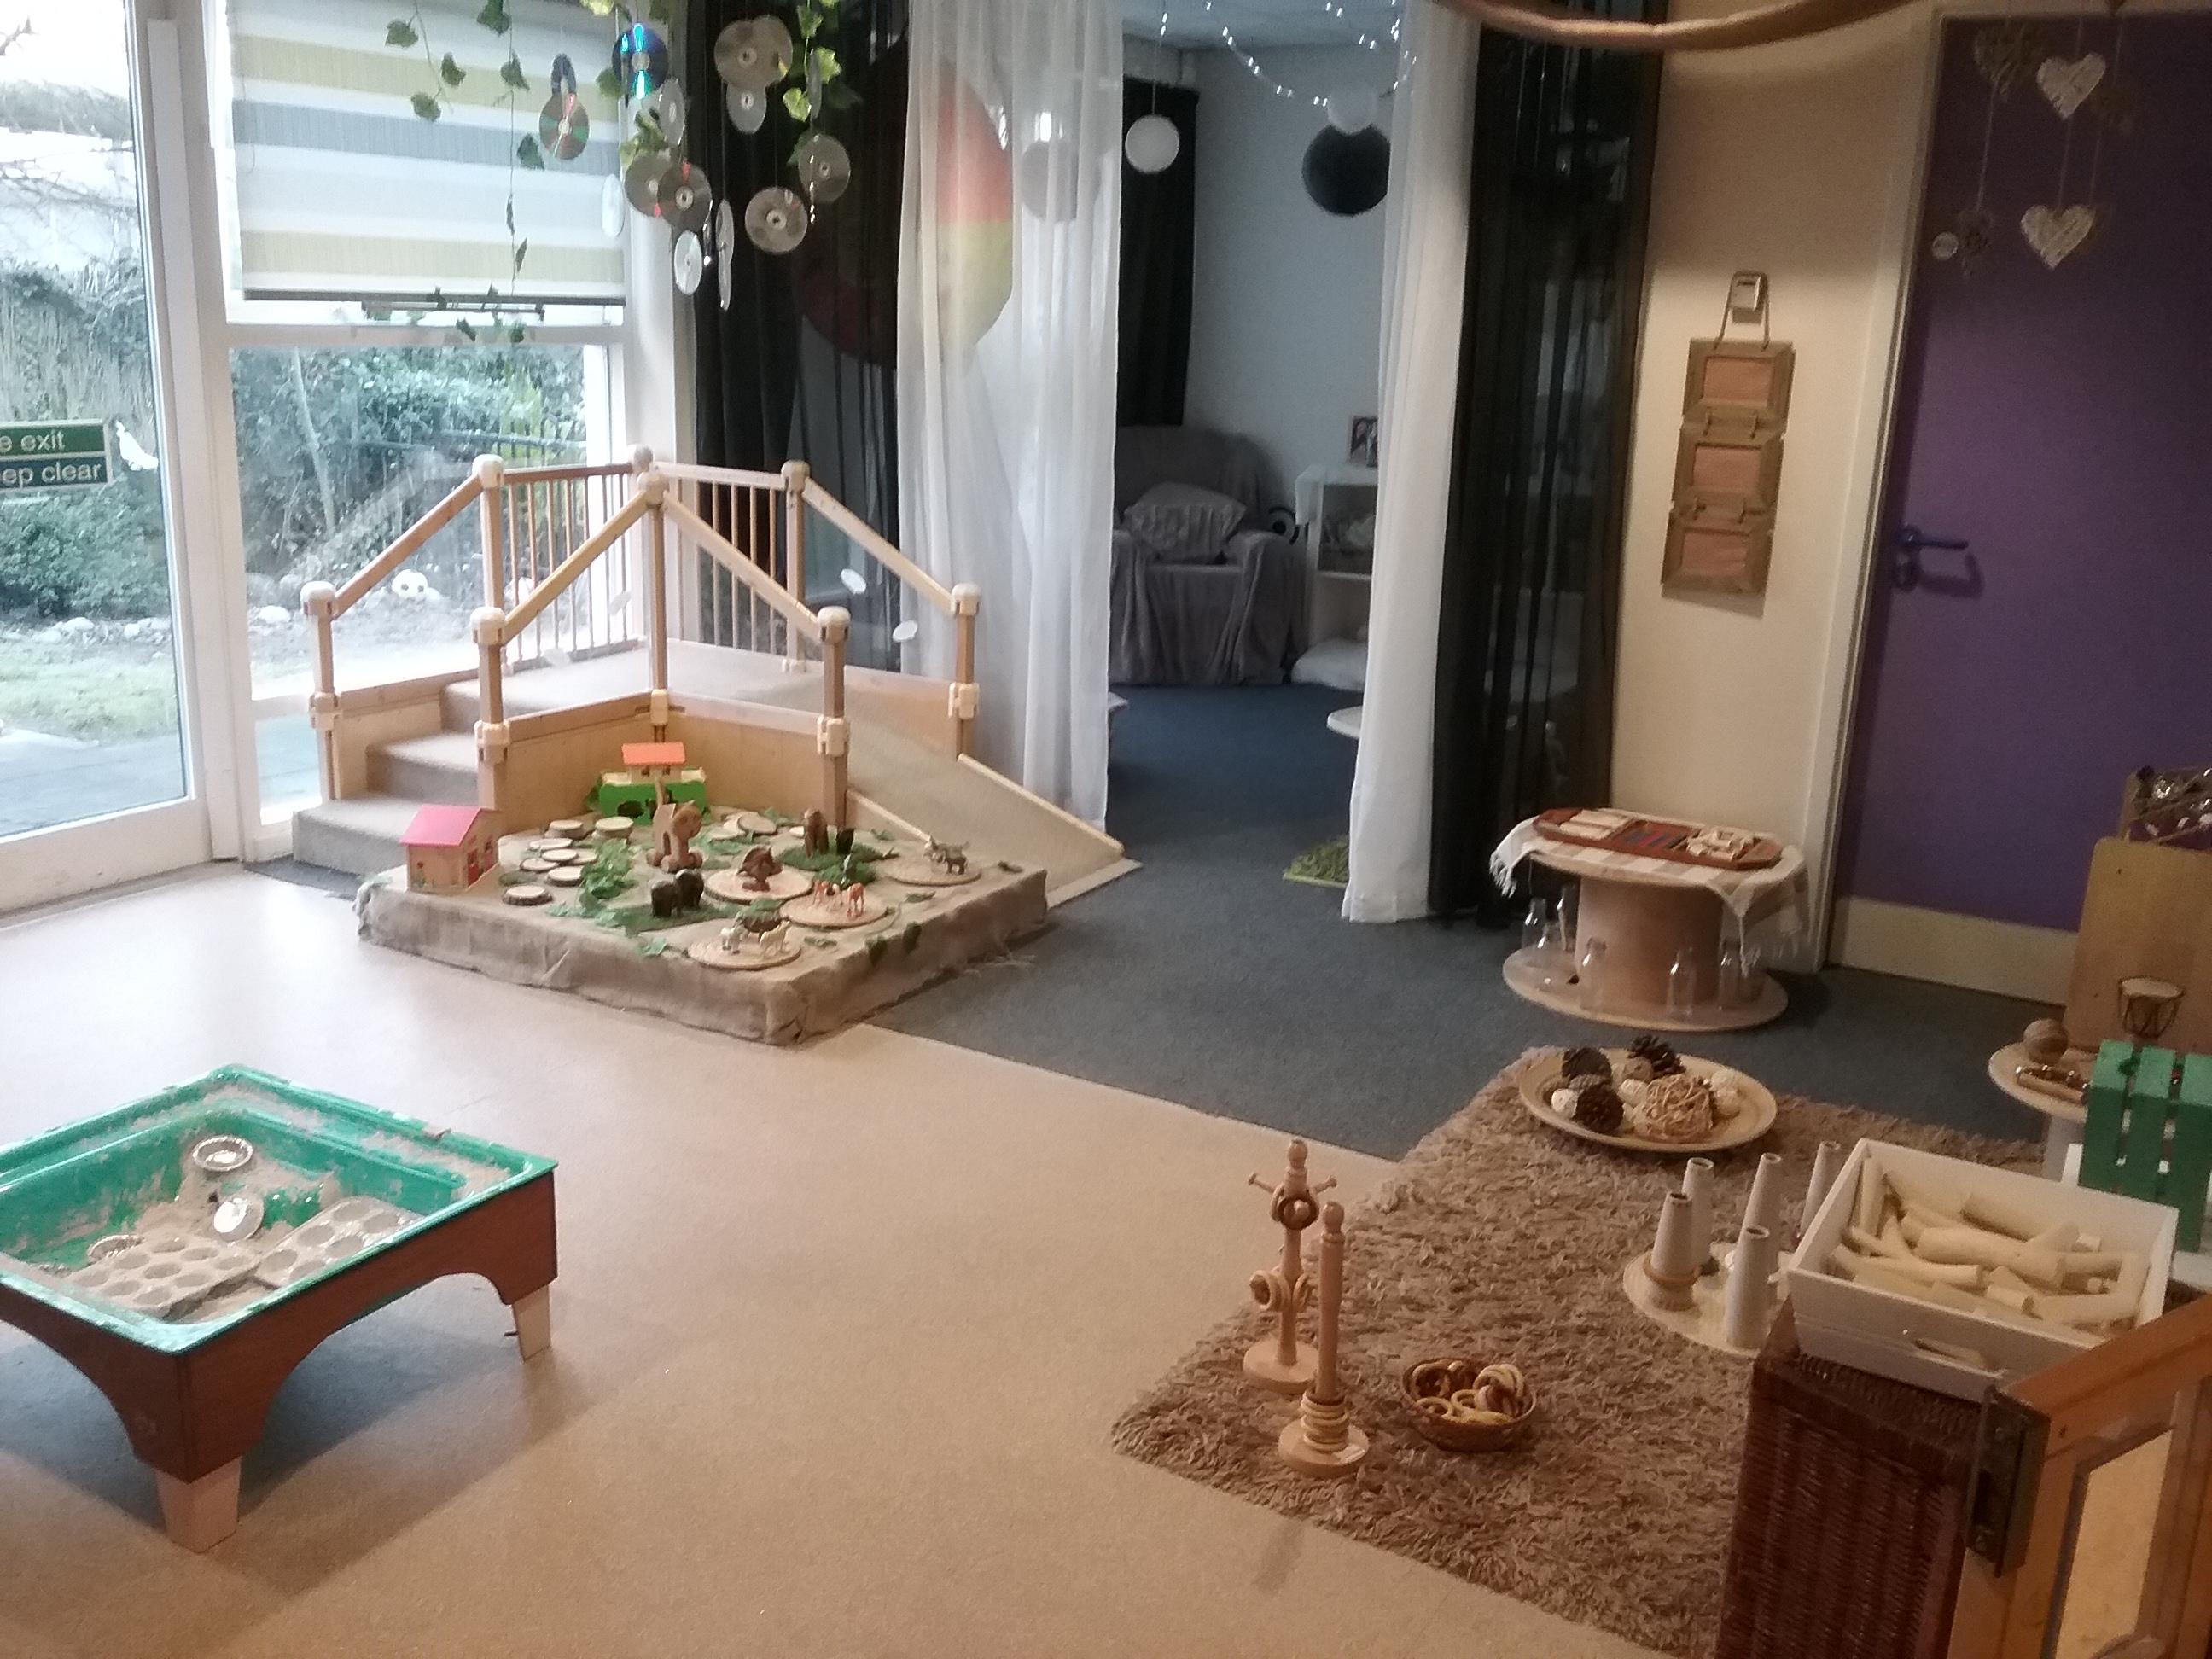 Baby Room - Play Days Nursery